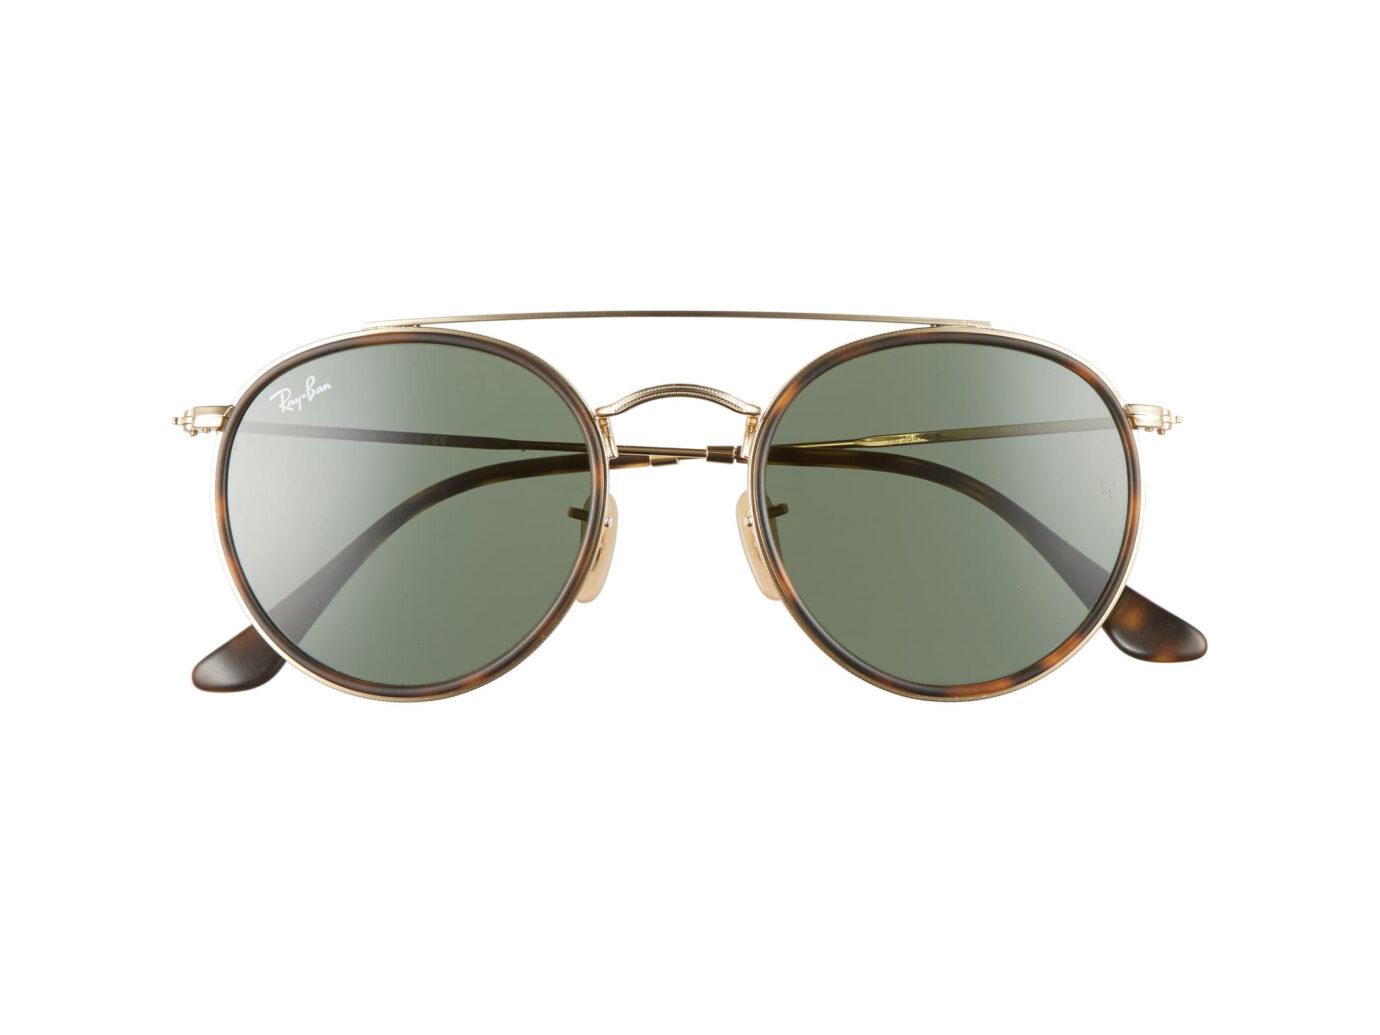 SUNNIES: Ray-Ban 51mm Aviator Sunglasses